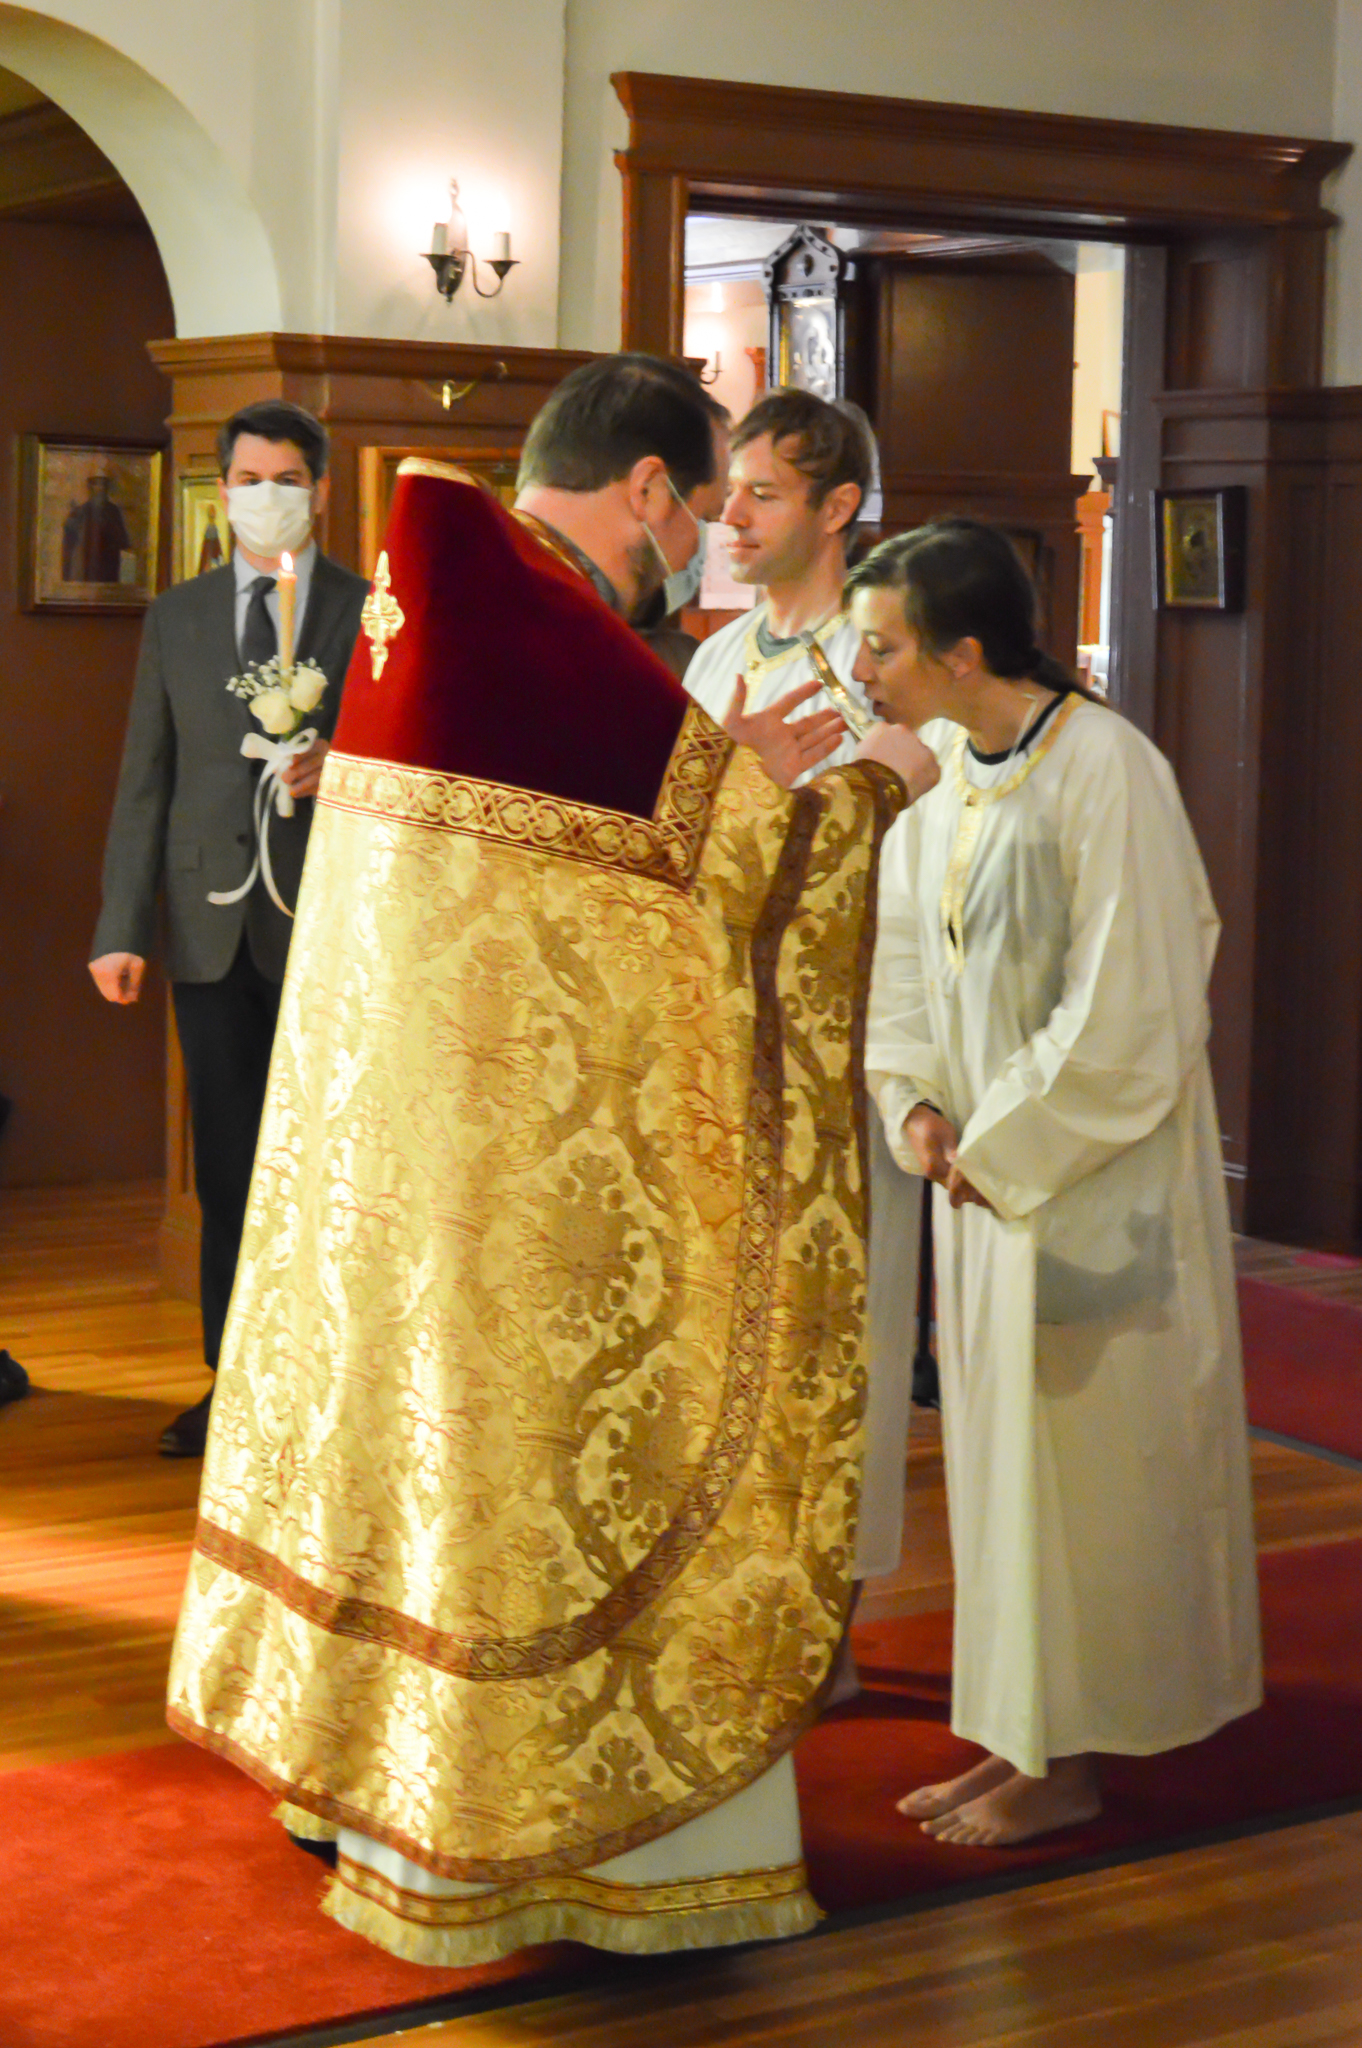 John-and-Alexandra-Baptism-Feb28-66